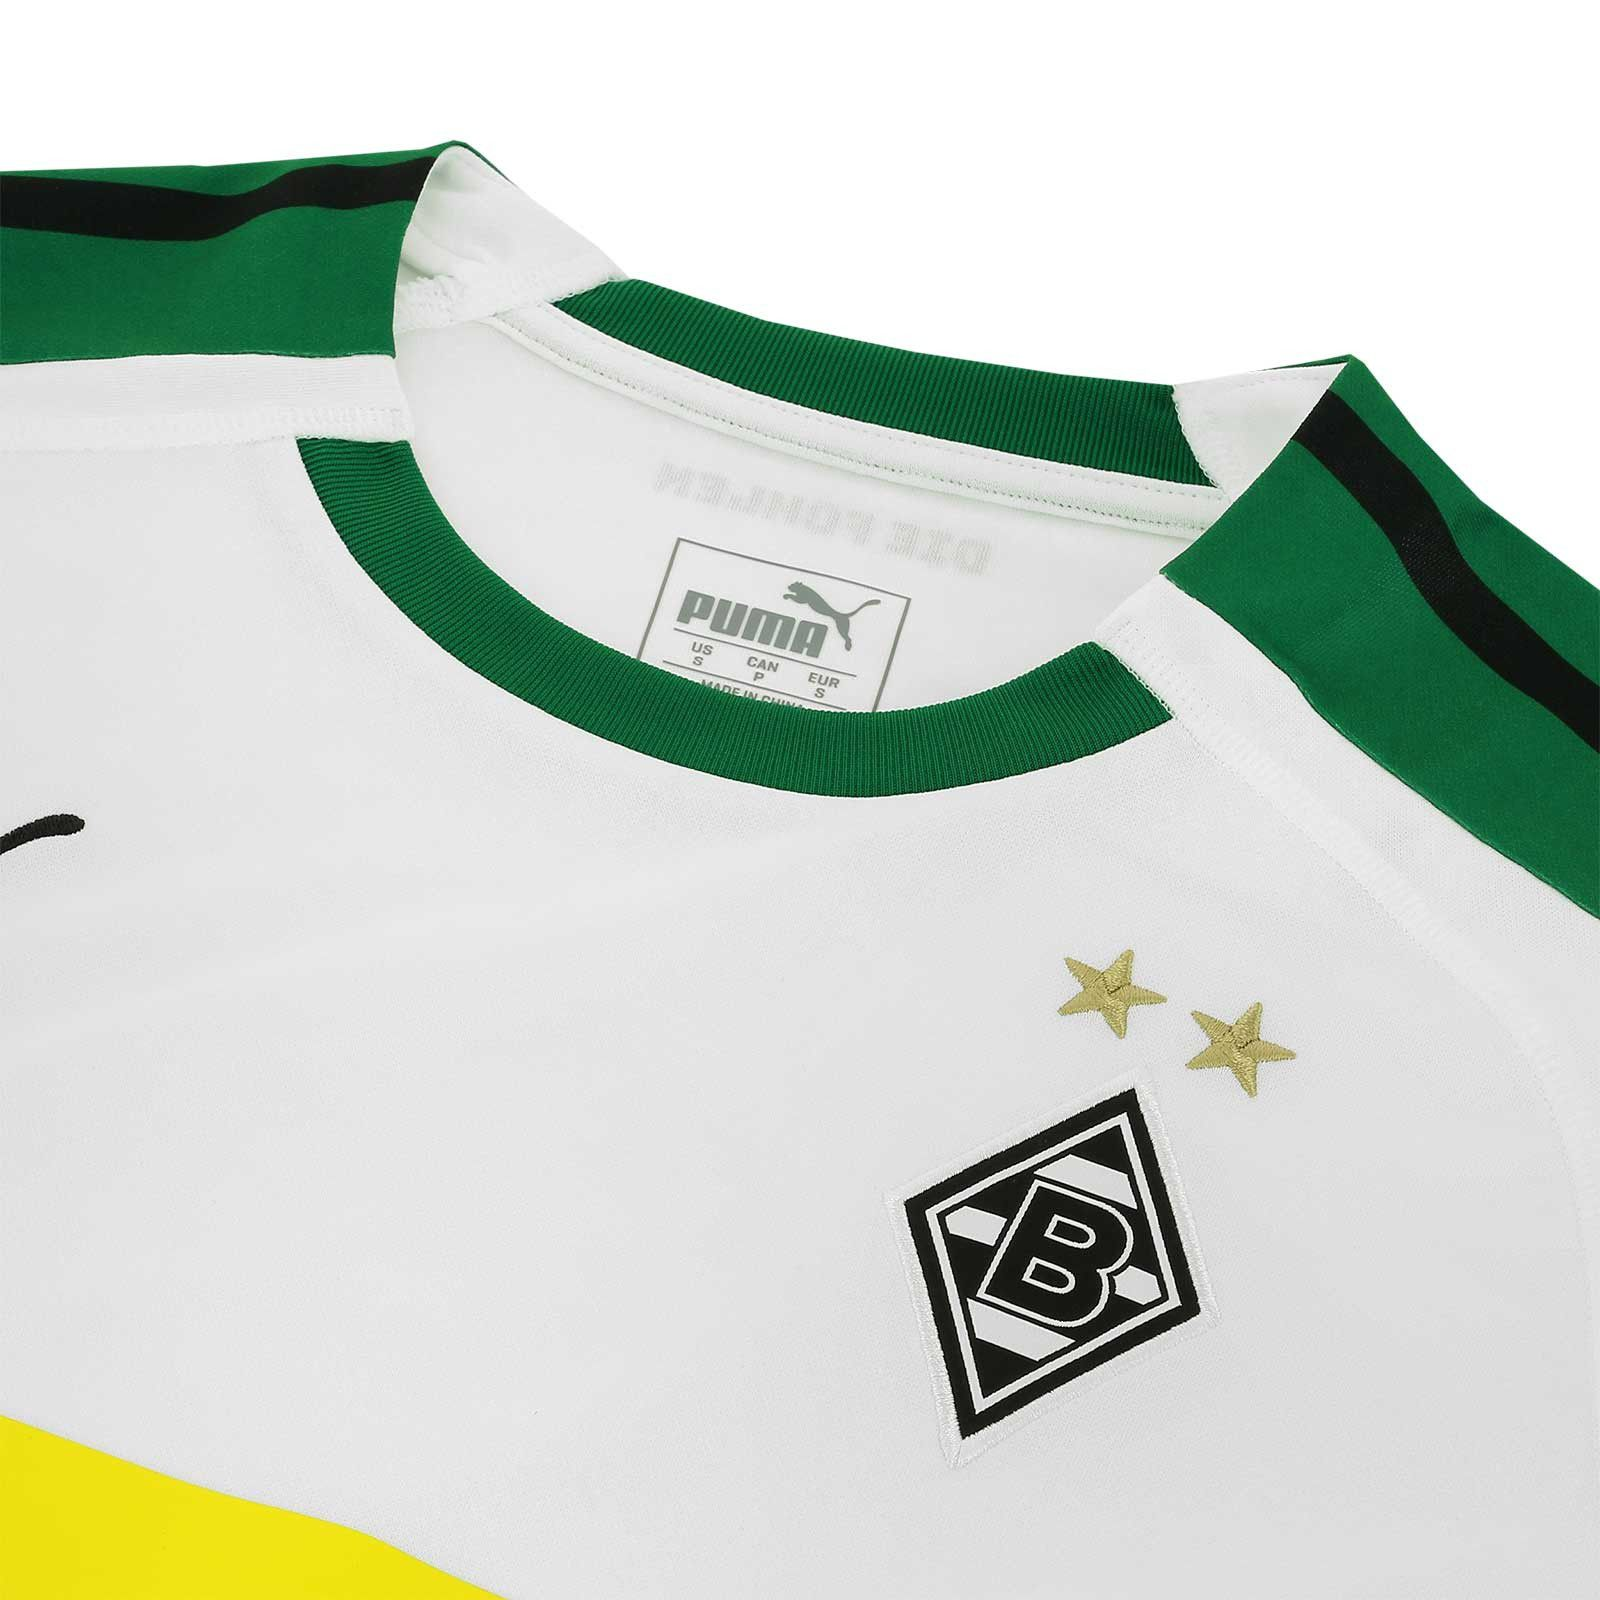 Camisa Borussia Mönchengladbach Home Puma 2018